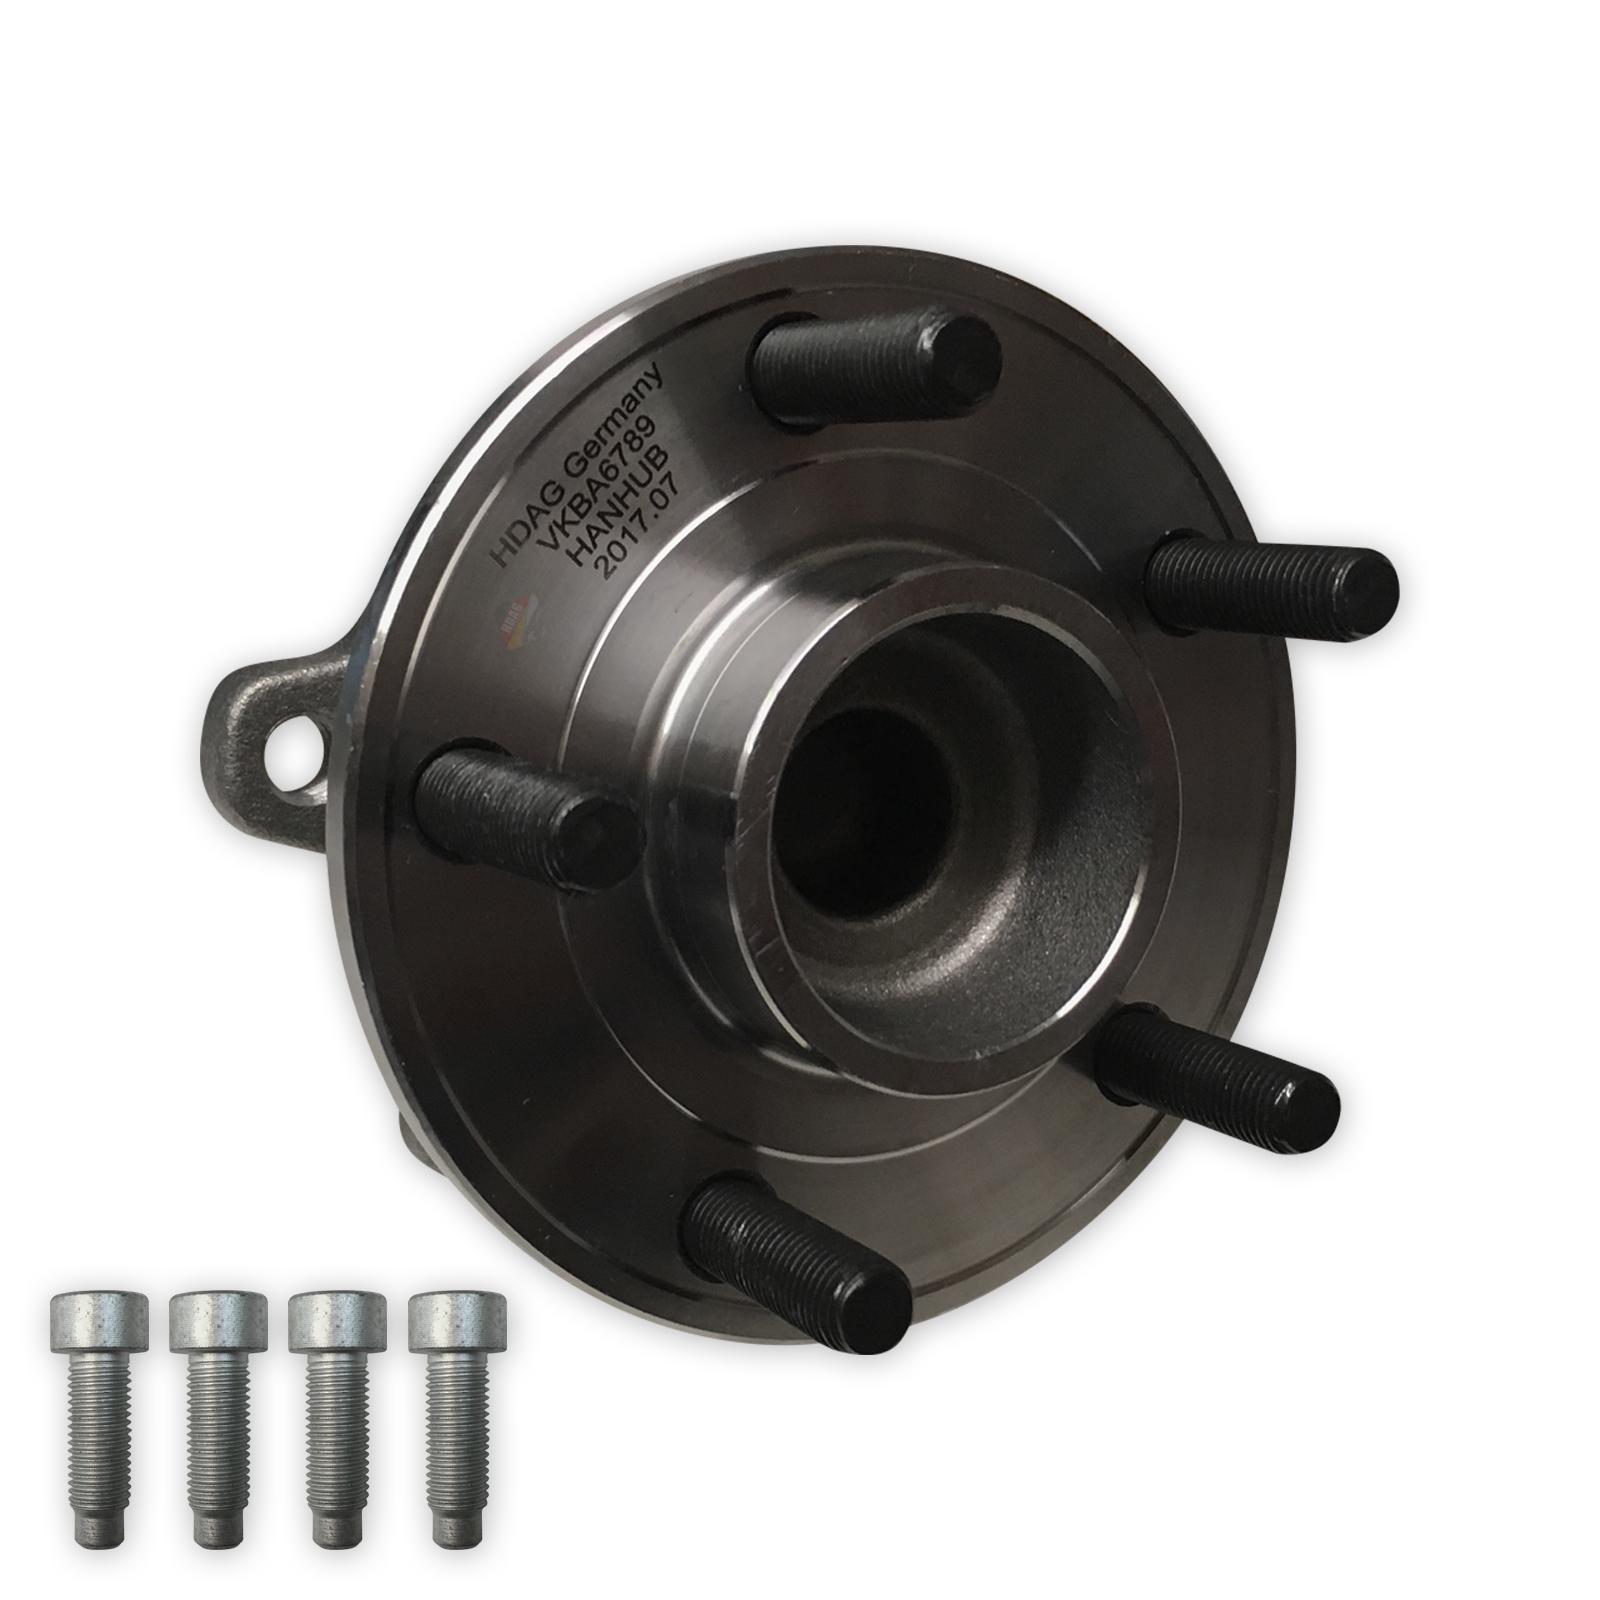 Ford Focus MK3 2011-2015 Rear Hub Wheel Bearing Kit Inc ABS Sensor